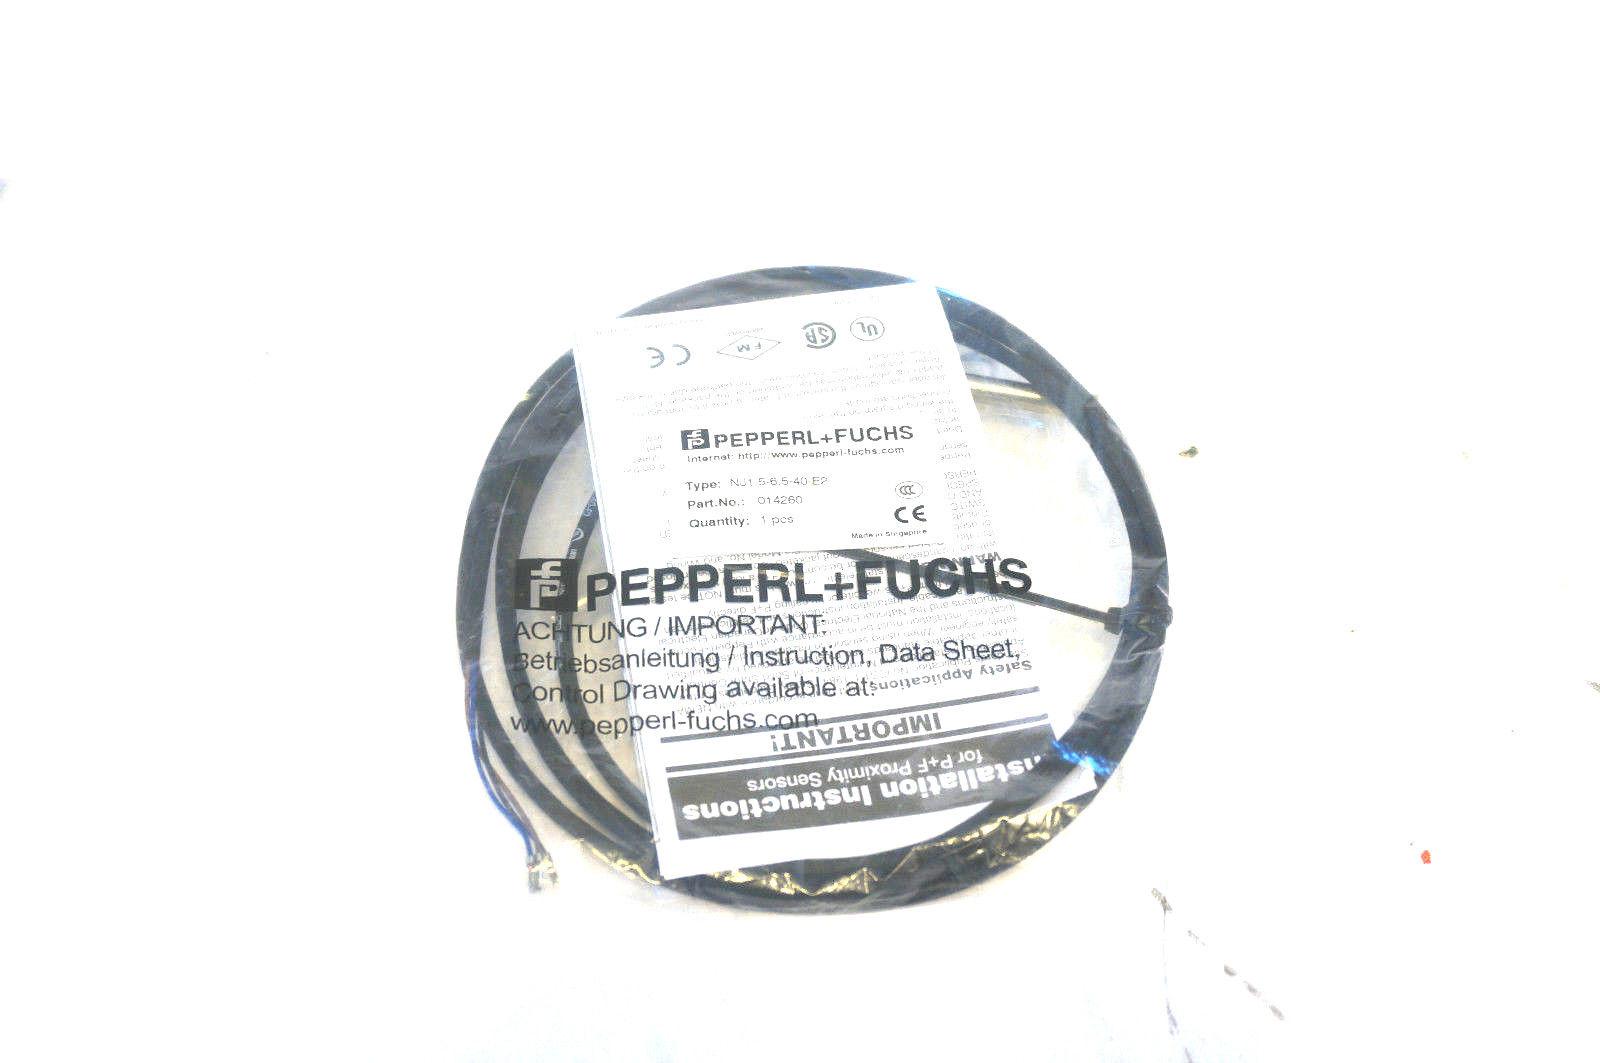 NEW PEPPERL & FUCHS NJ1.5-6.5-40-E2 INDUCTIVE SENSOR